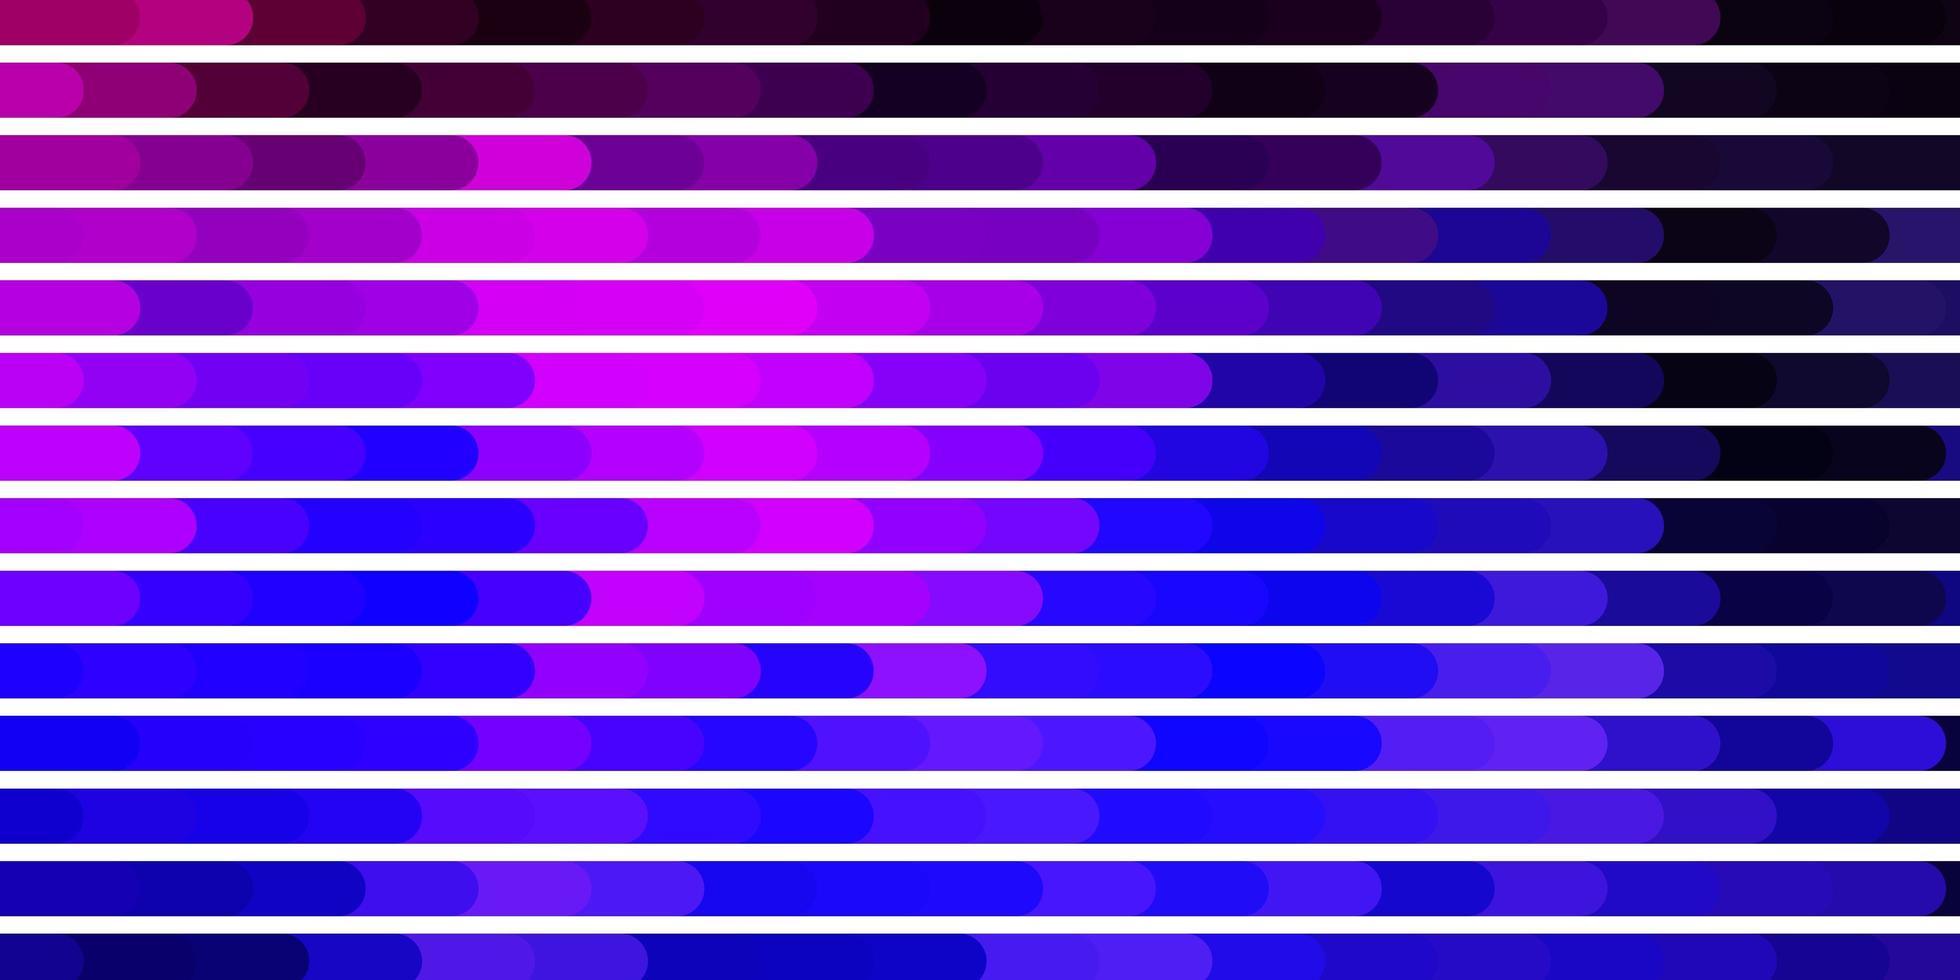 plantilla de vector de color púrpura oscuro, rosa con líneas.